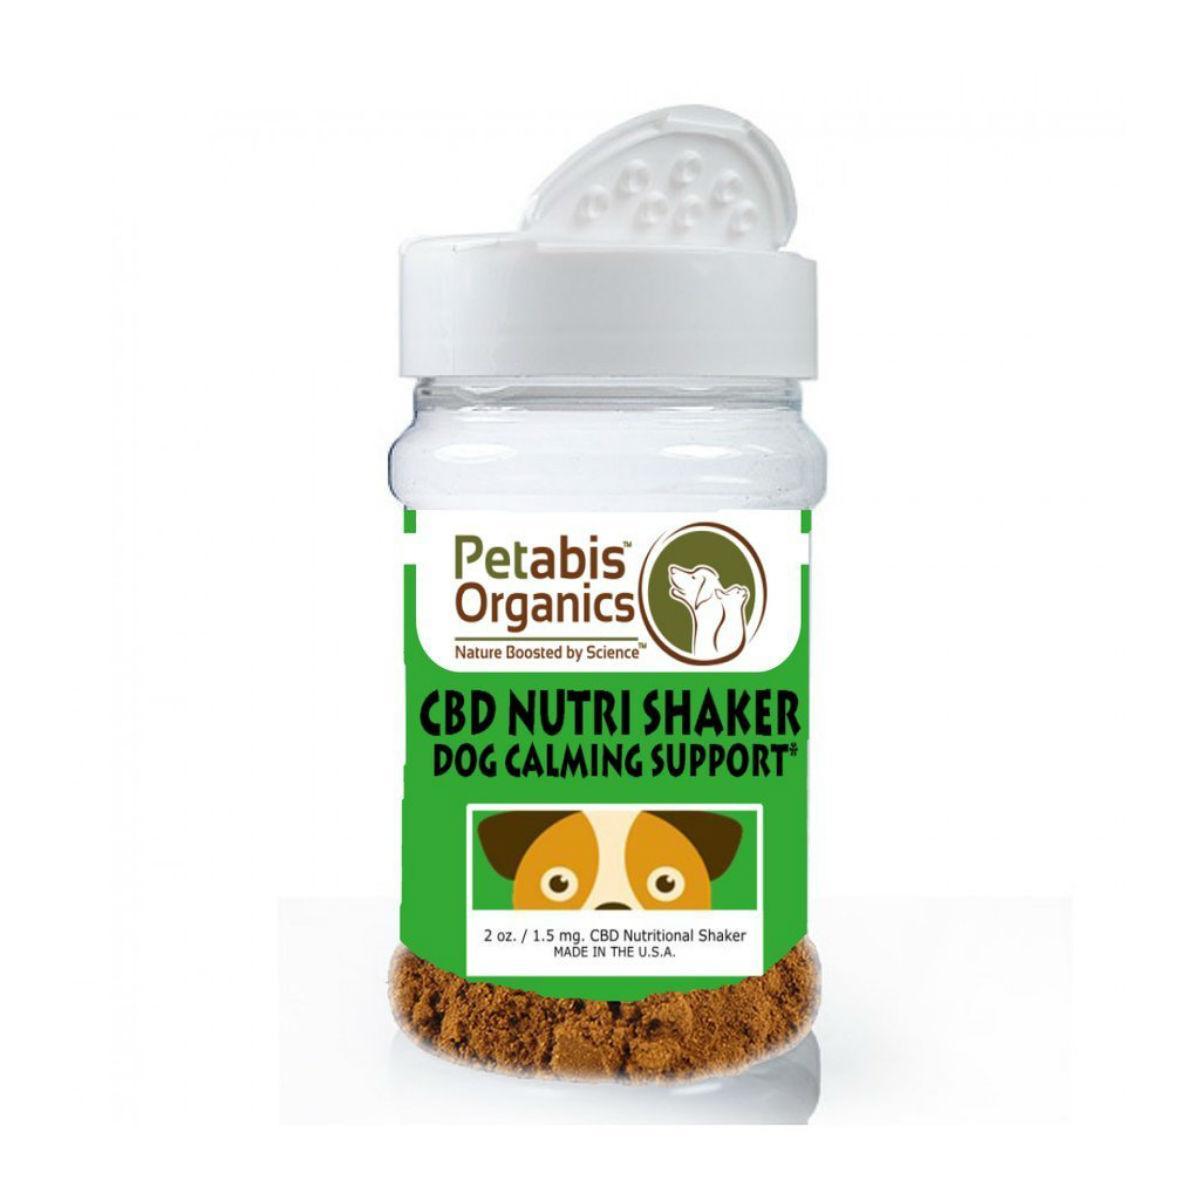 Petabis Organics CBD Calming Nutri Shaker Dog Food Topper